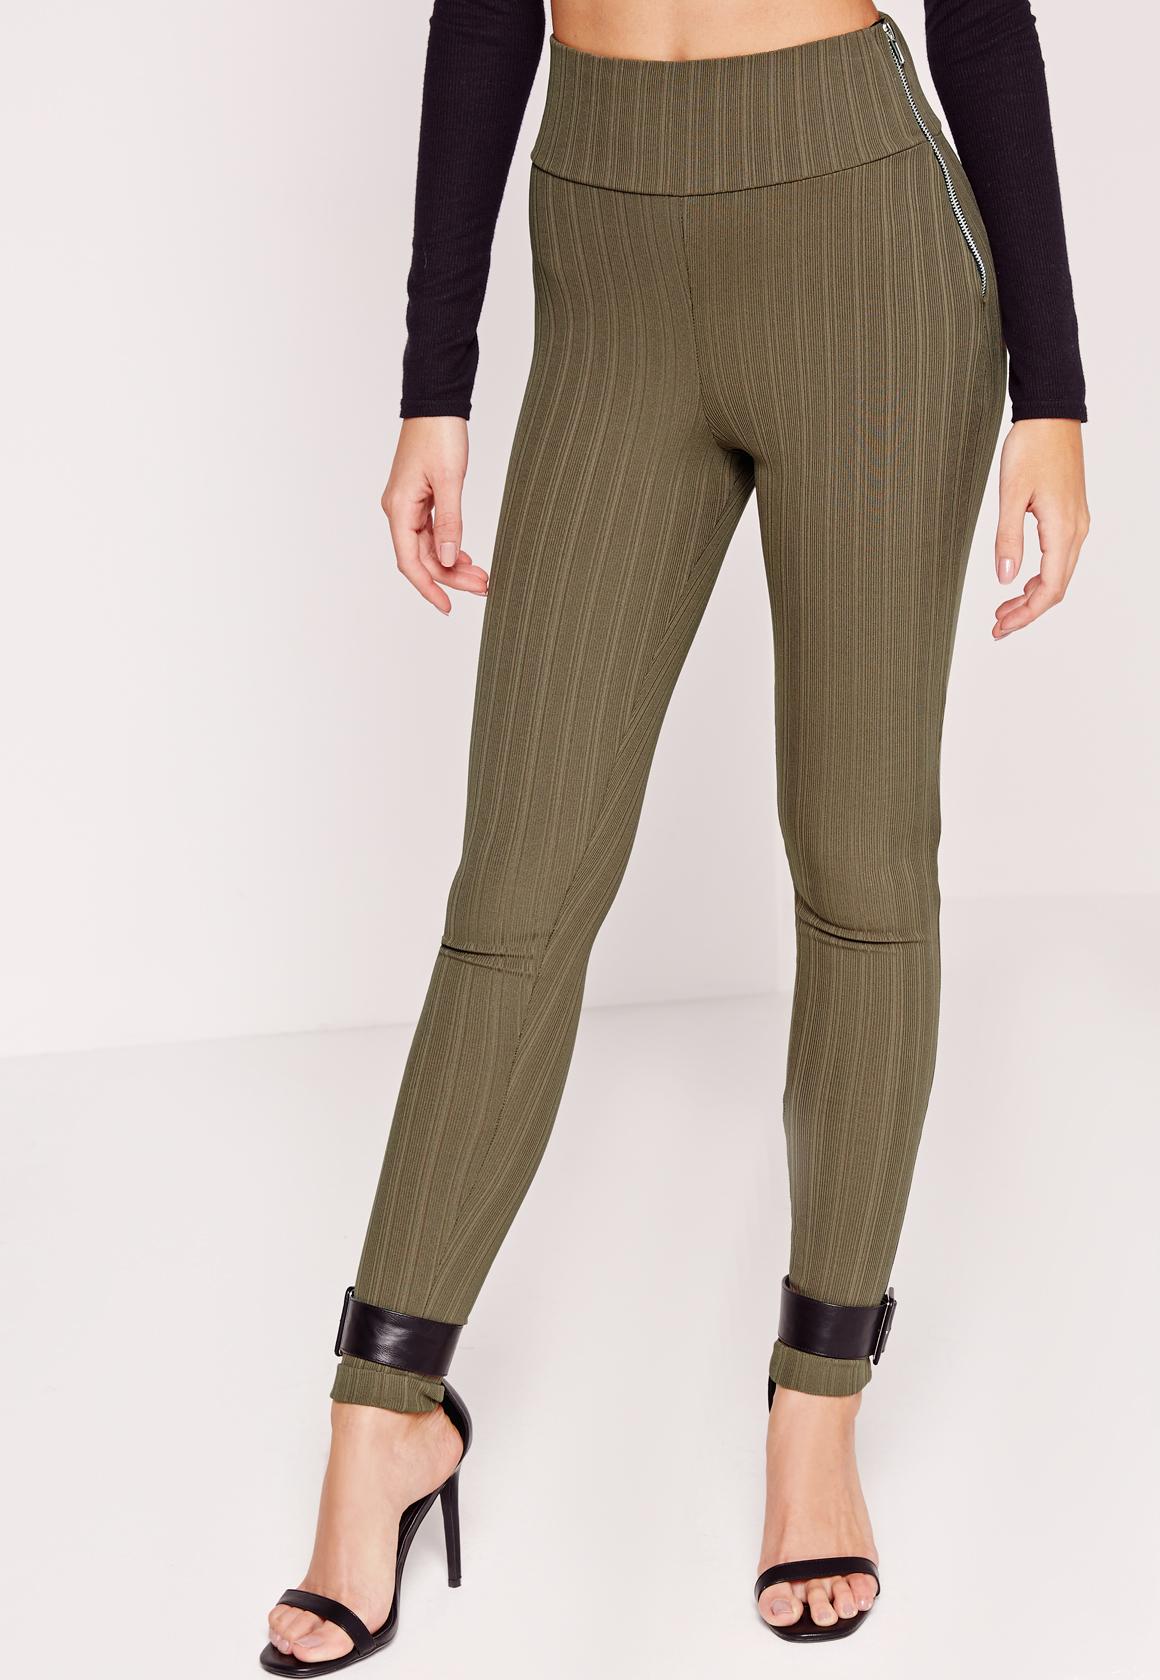 Leggings Depot Premium Quality Jeggings Regular and Plus Soft Cotton Blend Stretch Jean Leggings Pants w/Pockets by Leggings Depot $ - $ $ 11 99 - $ 13 97 Prime.